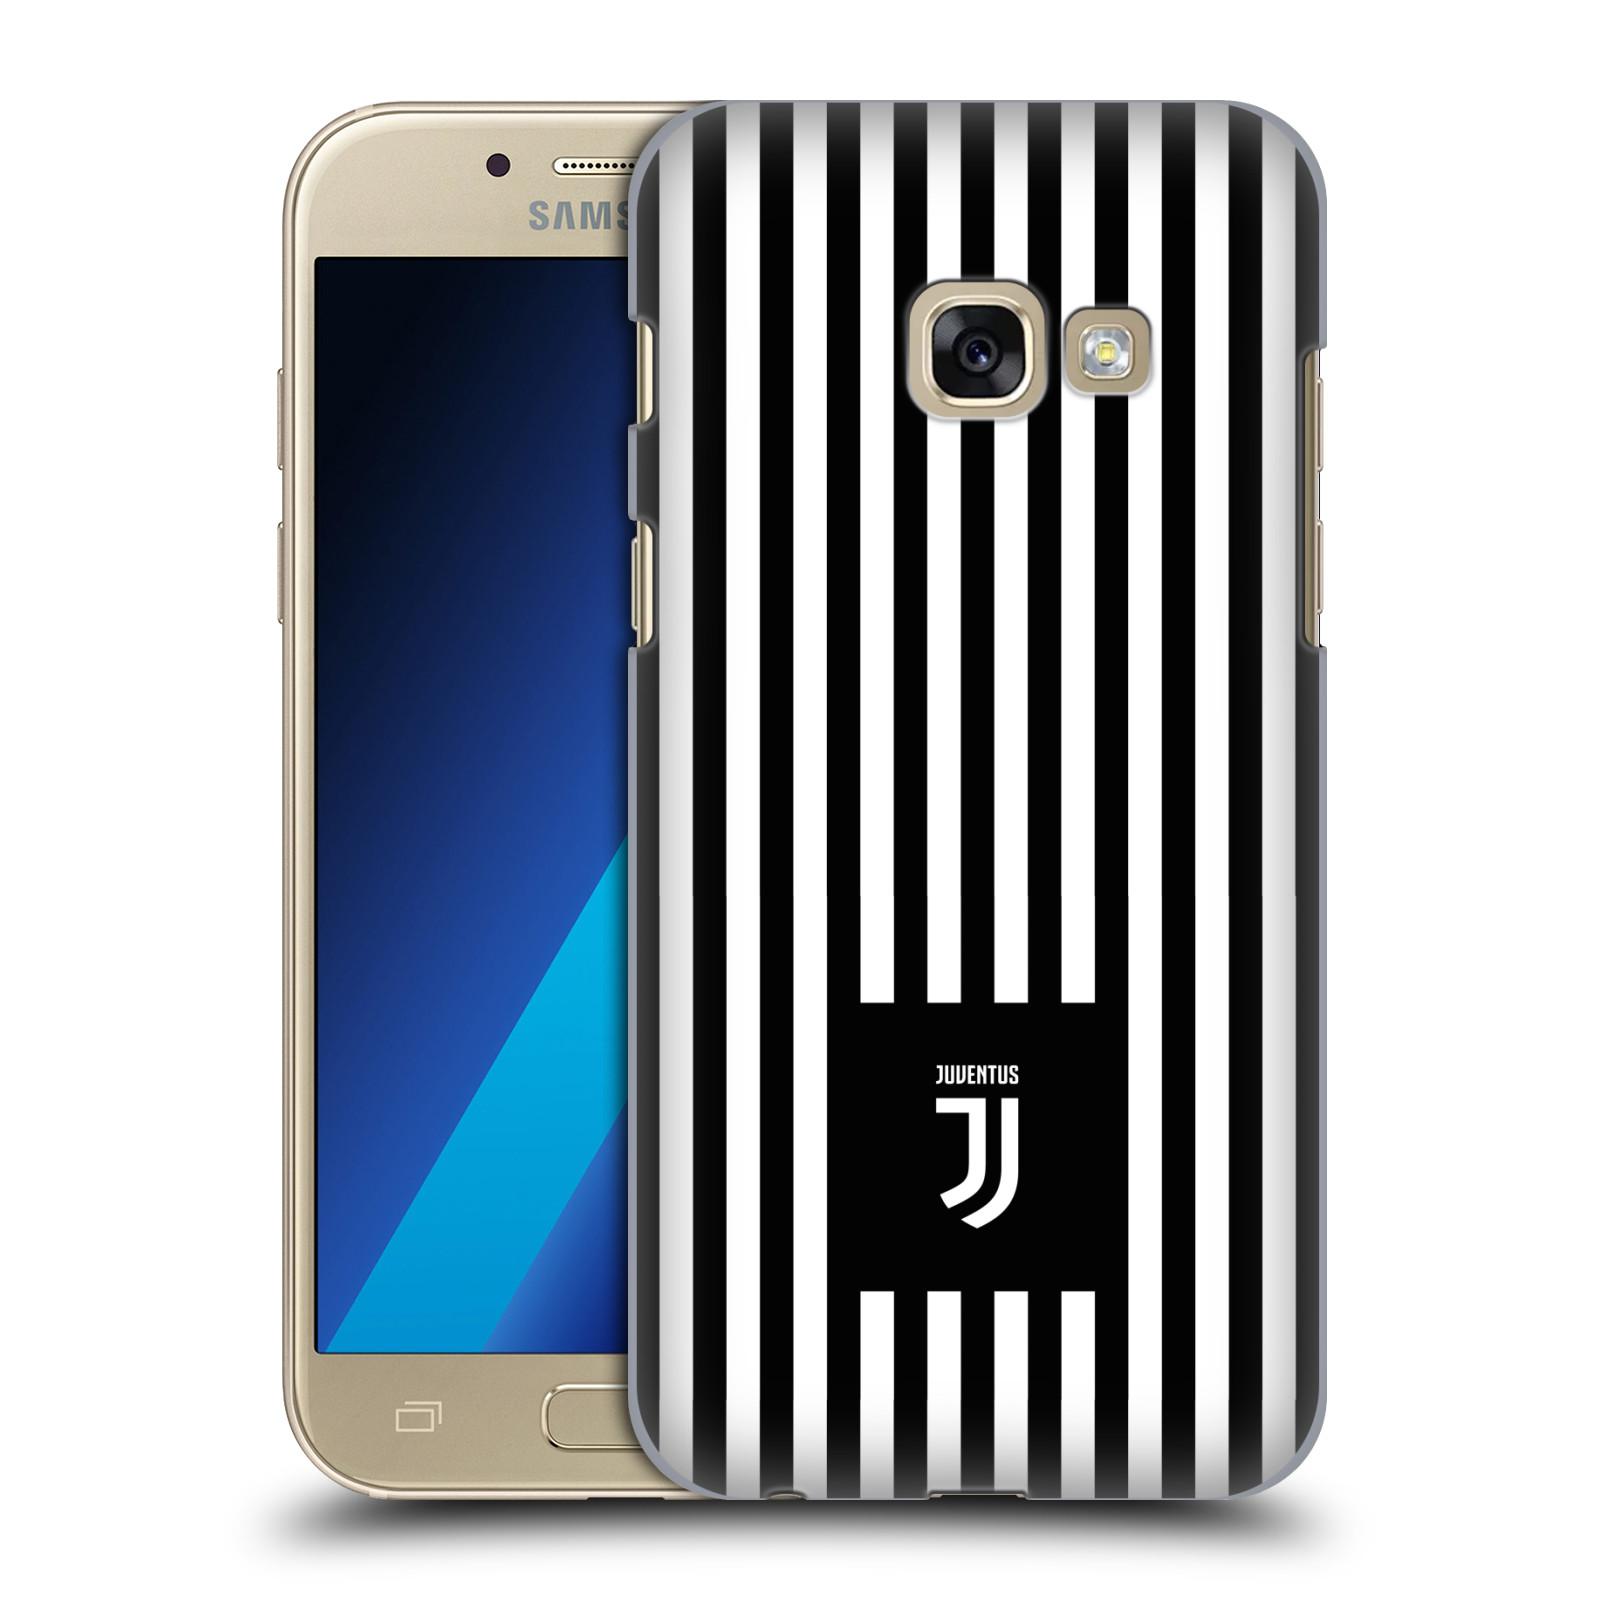 Plastové pouzdro na mobil Samsung Galaxy A3 (2017) - Head Case - Juventus FC - Nové logo - Pruhy